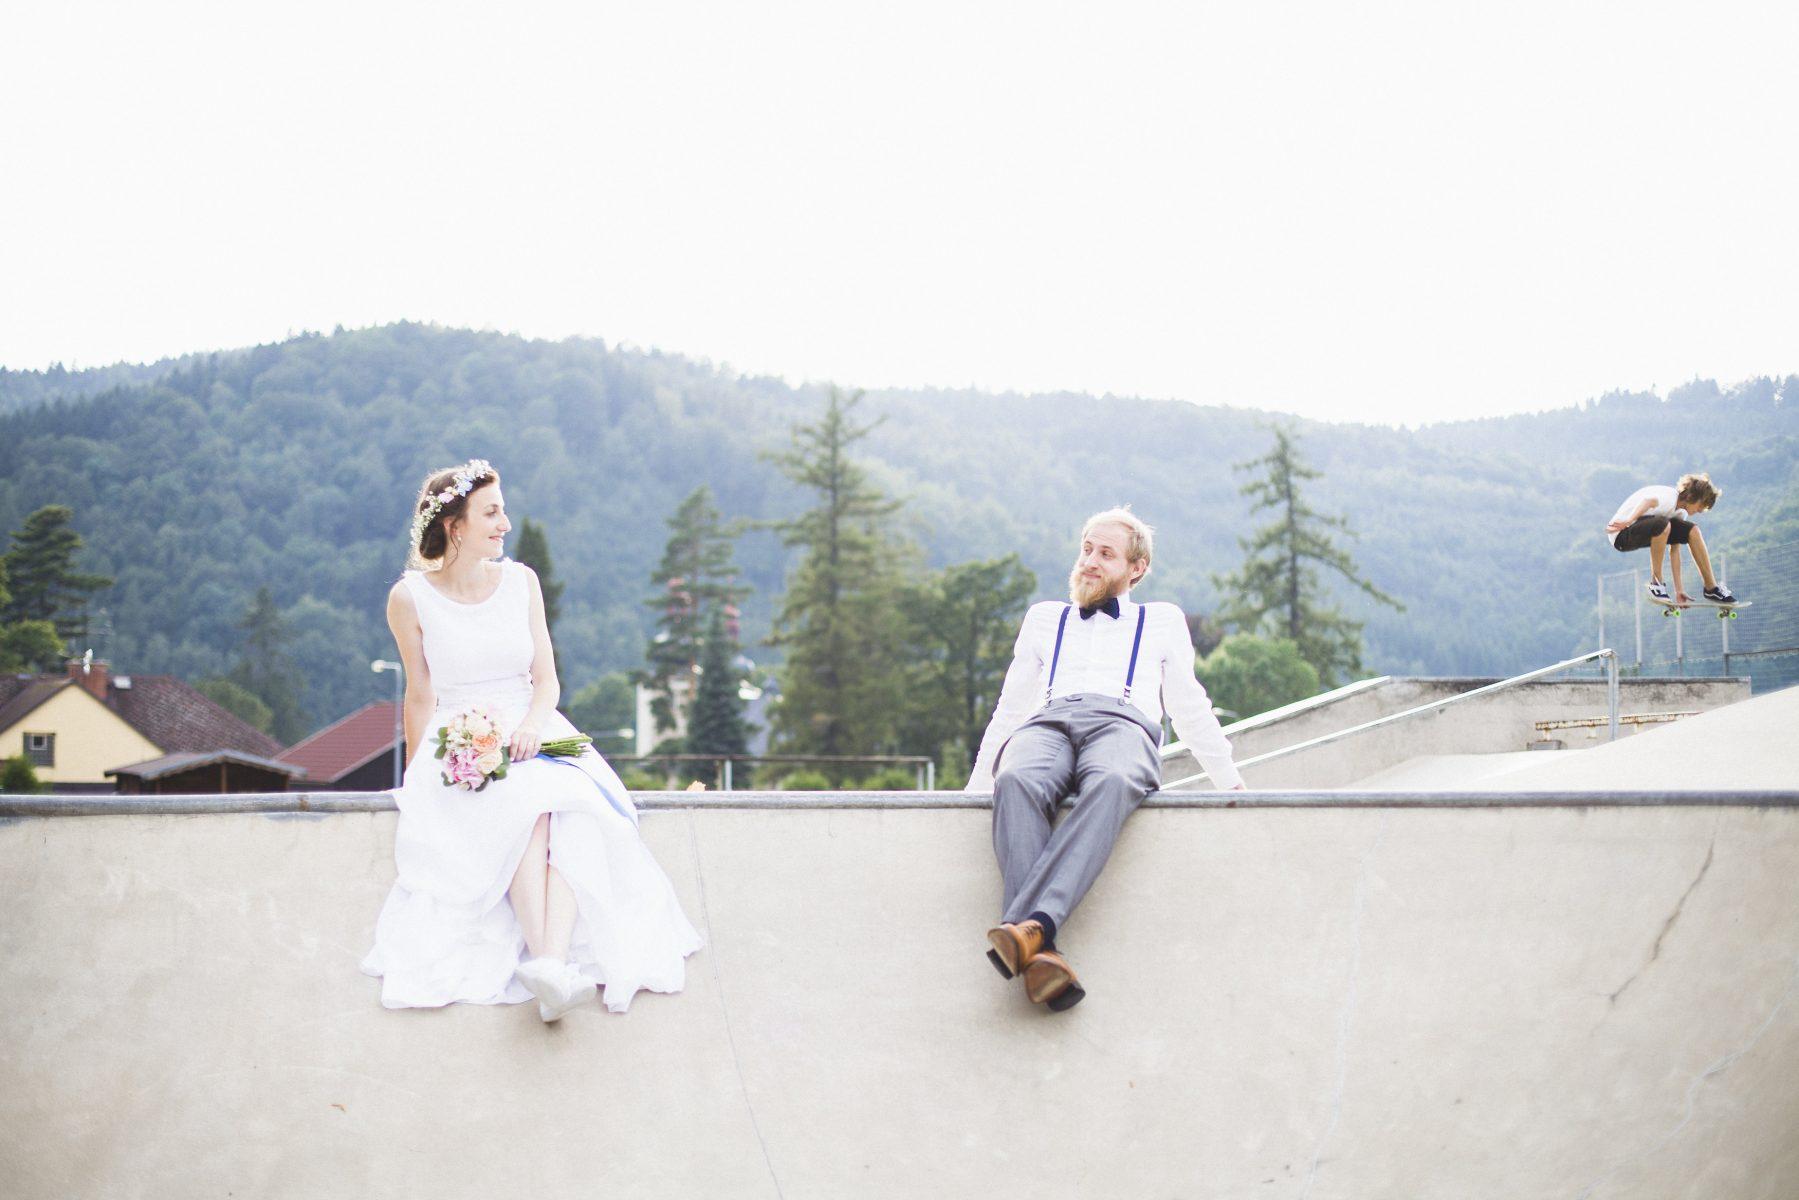 Edinburgh Alternative Wedding Photographer   Skatepark Photoshoot Elopement   Ceranna Photography